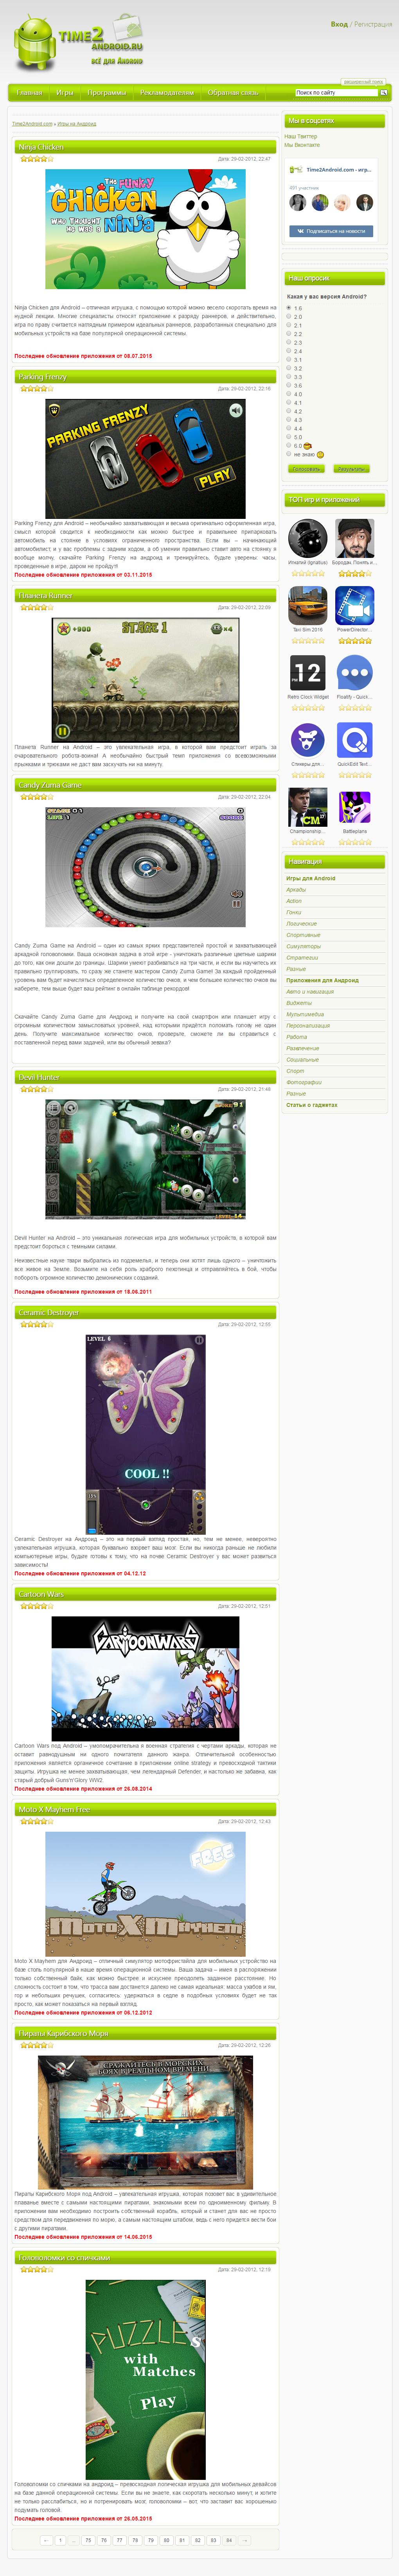 Сайт игр/приложений для Android